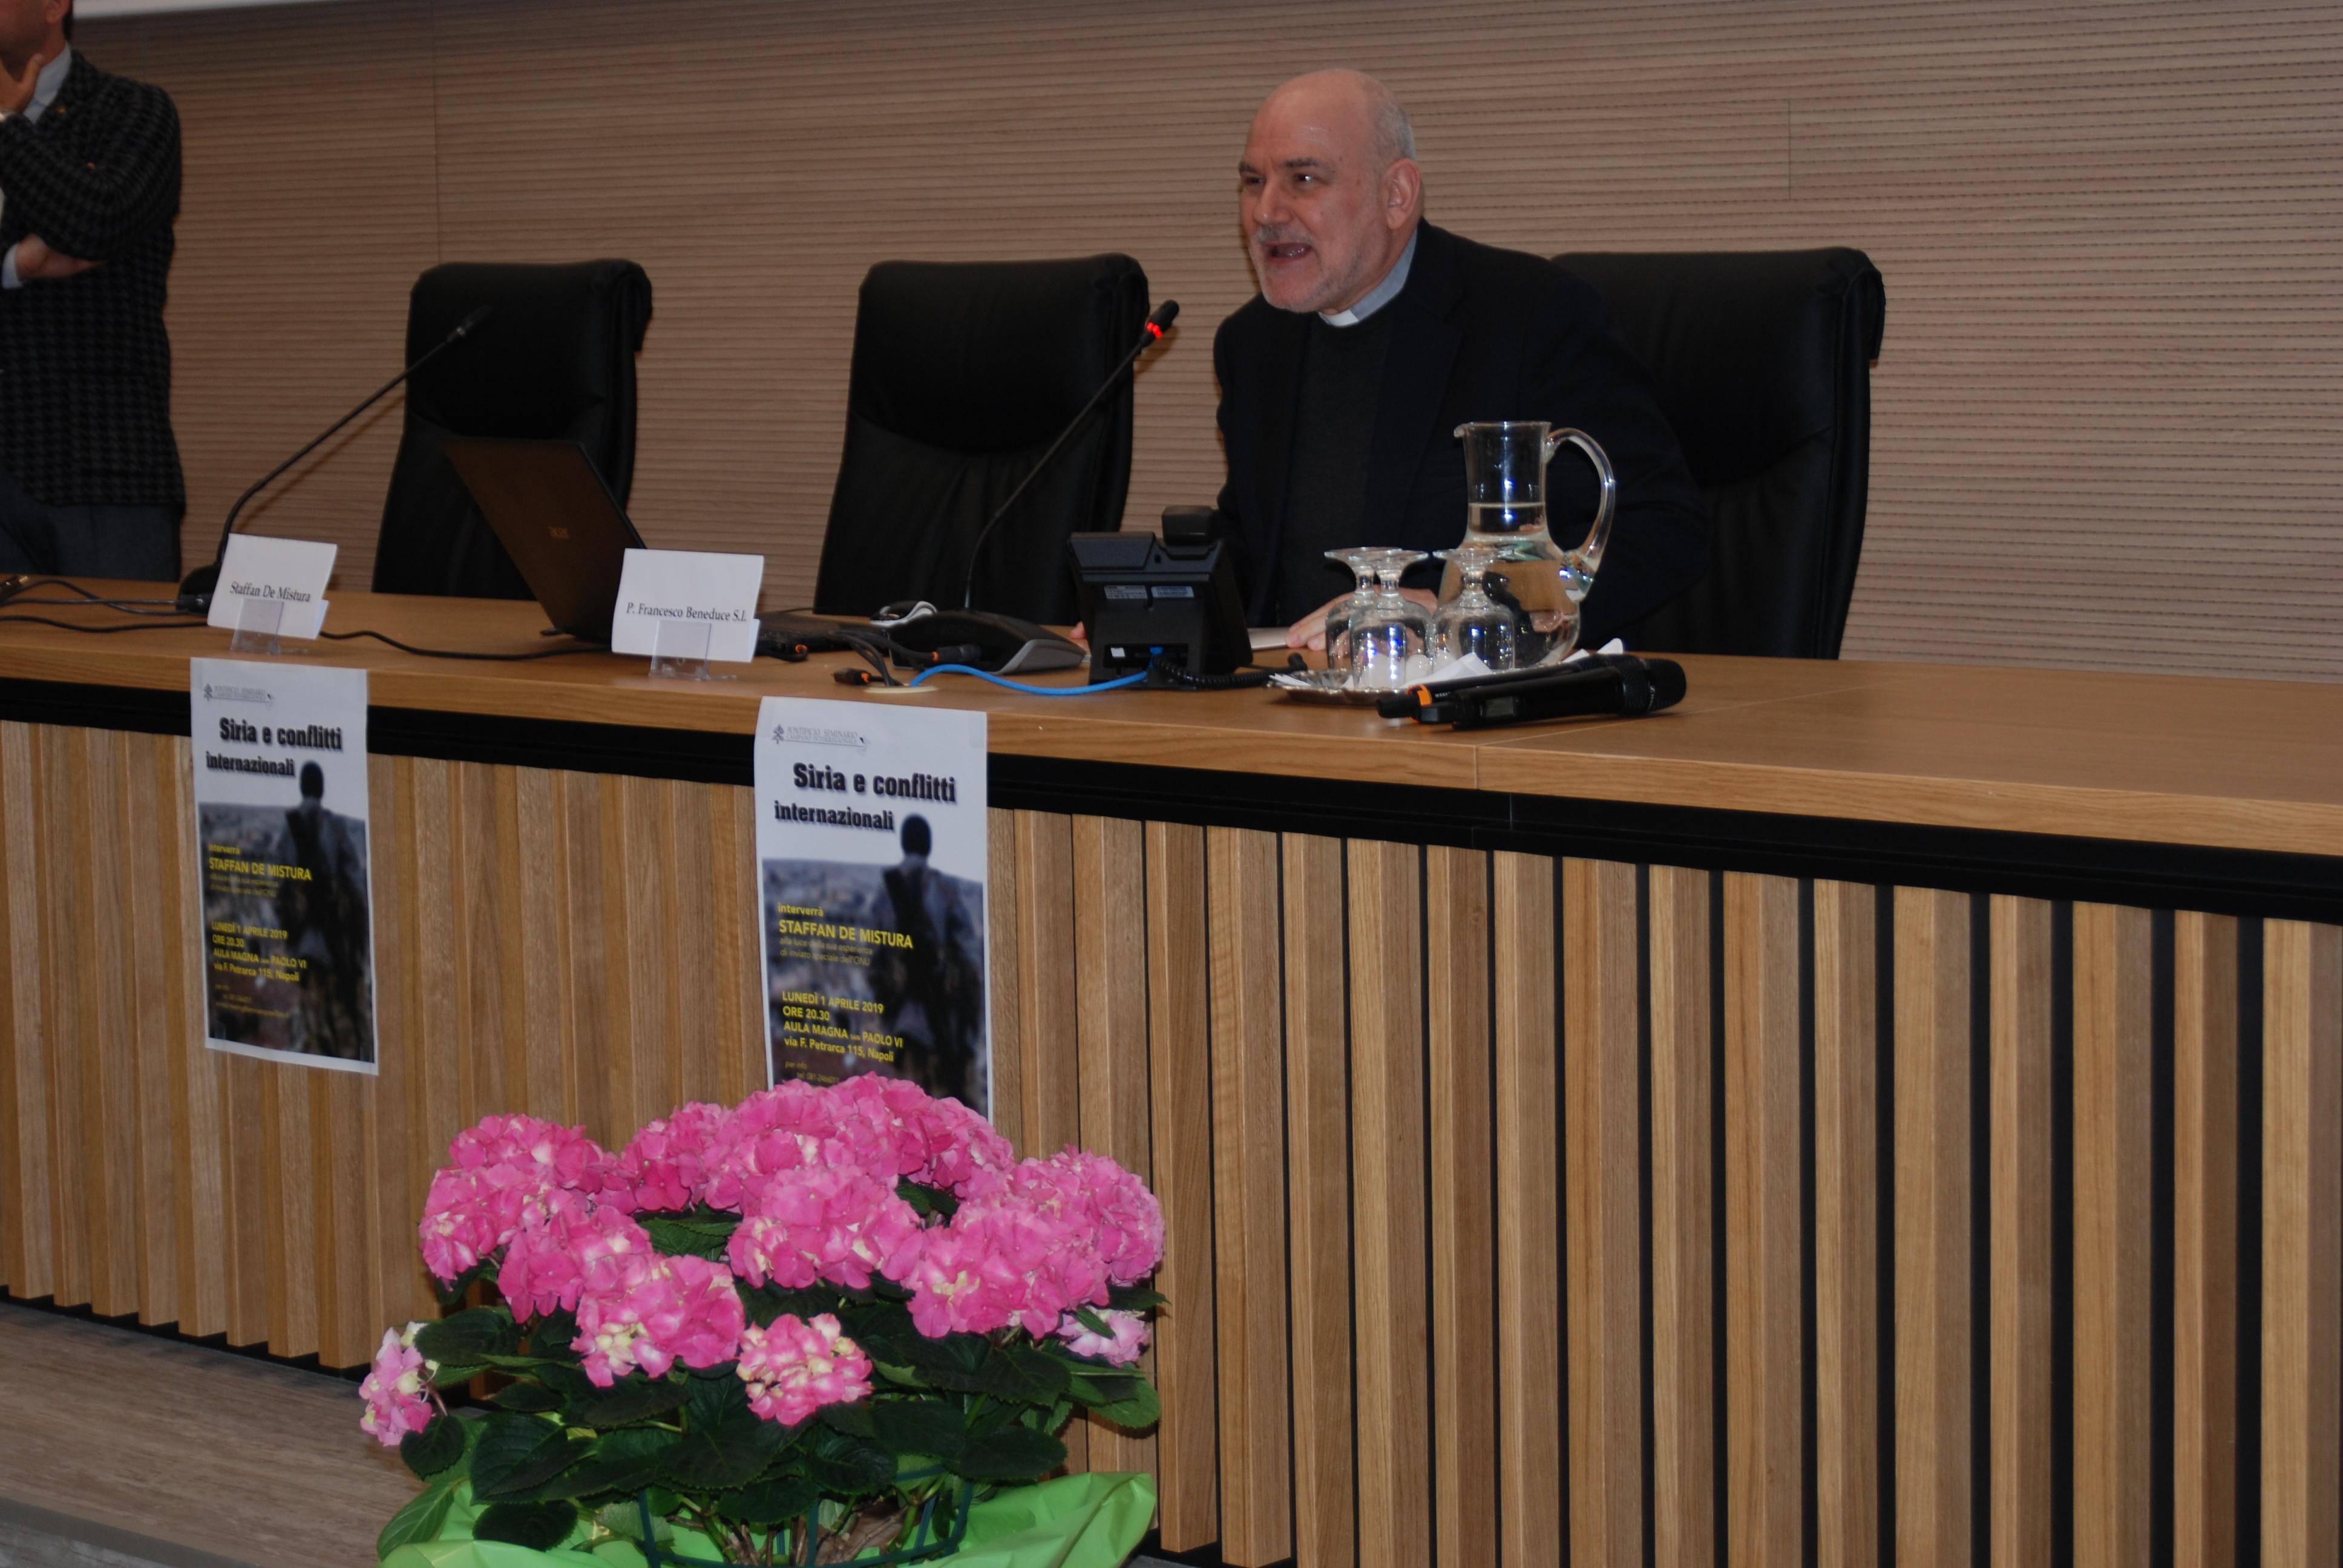 Staffan de Mistura in seminario (12)